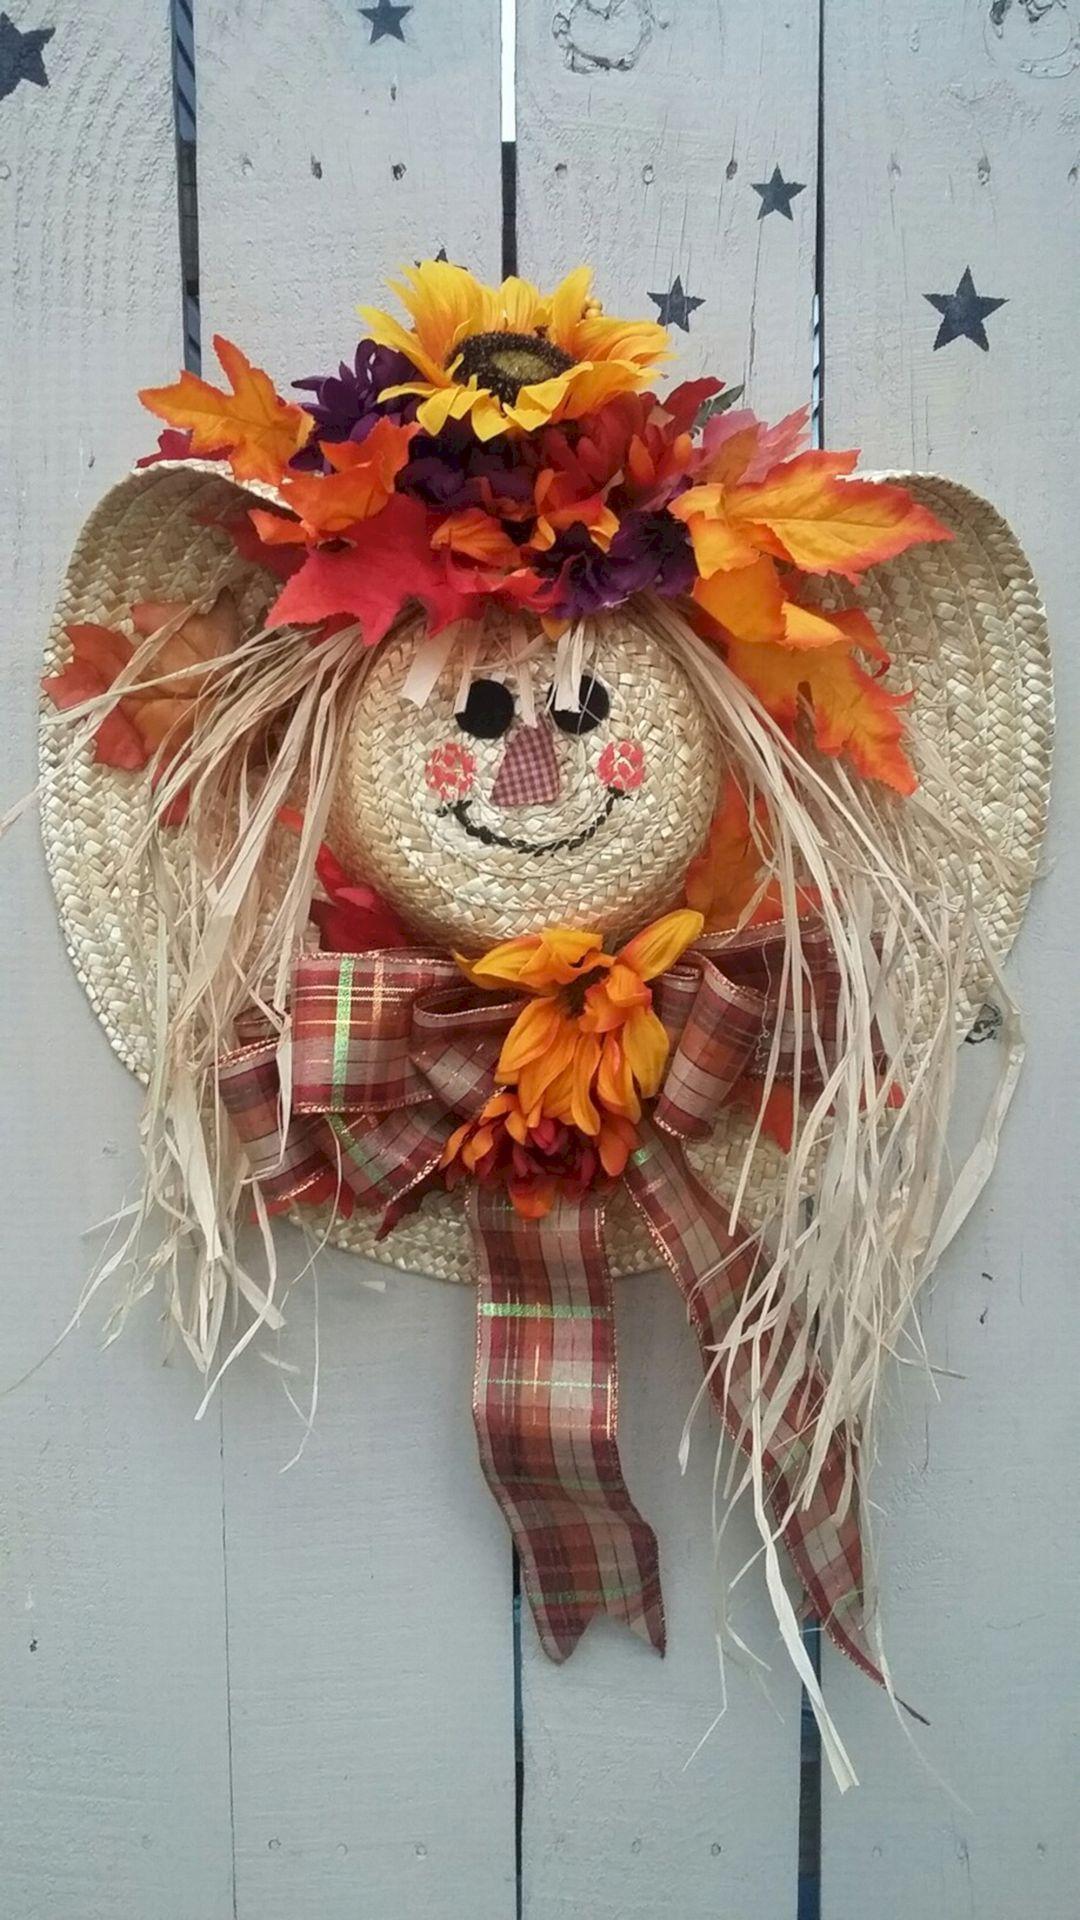 Best Ideas To Create Fall Wreaths Diy: Top 30 Handy Inspirations #diyfalldecor